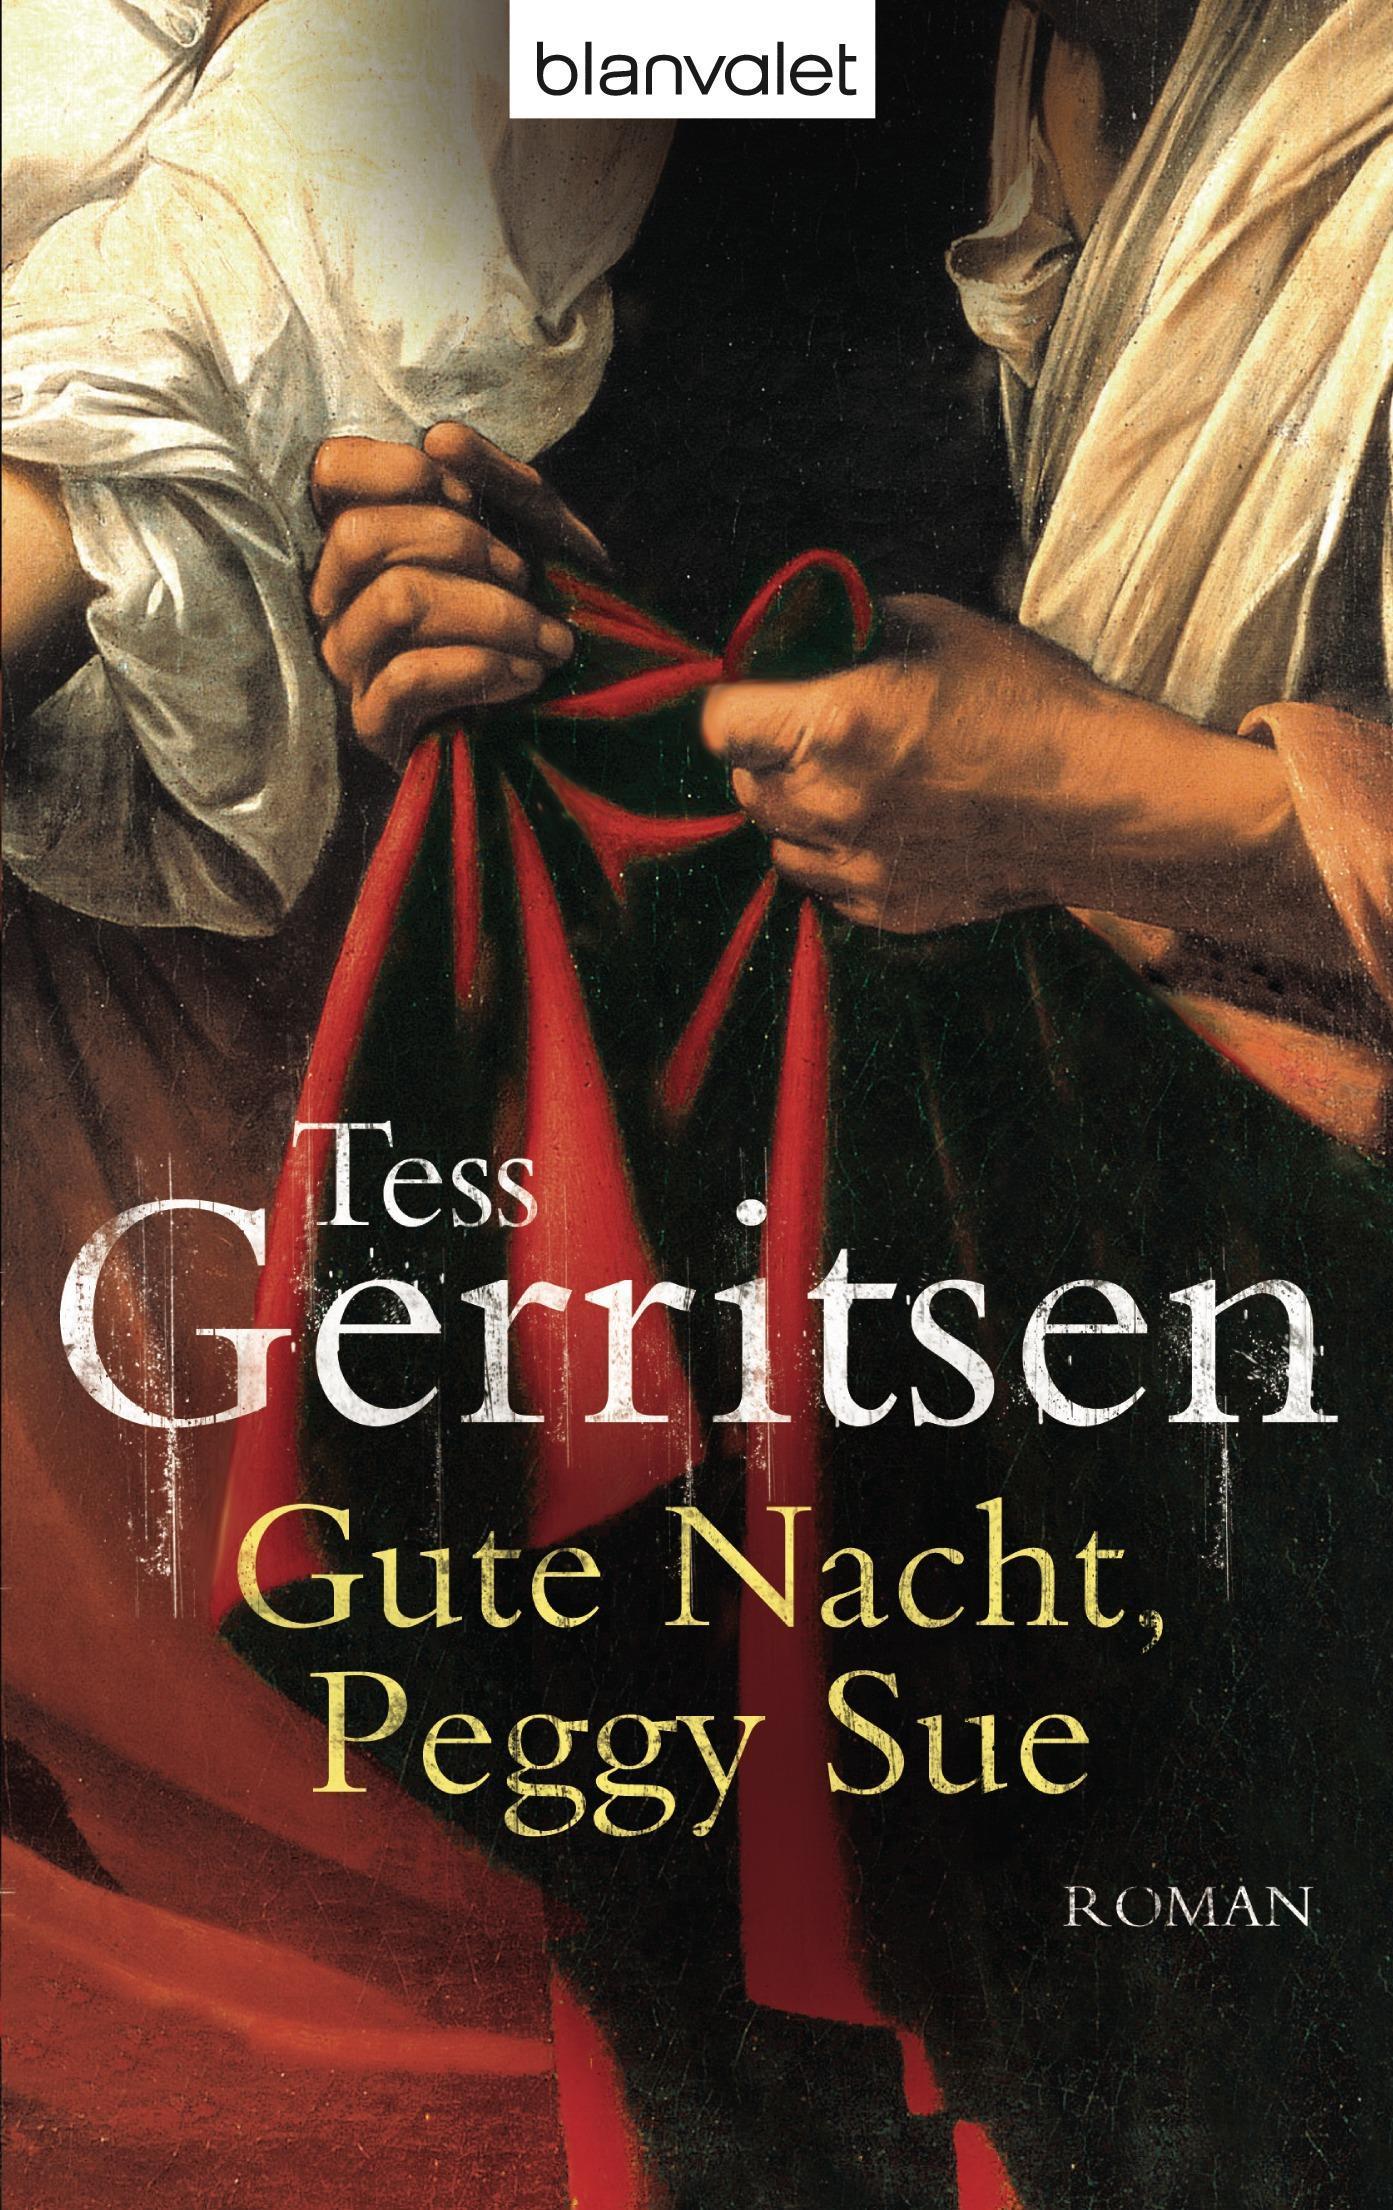 Gute Nacht, Peggy Sue Tess Gerritsen